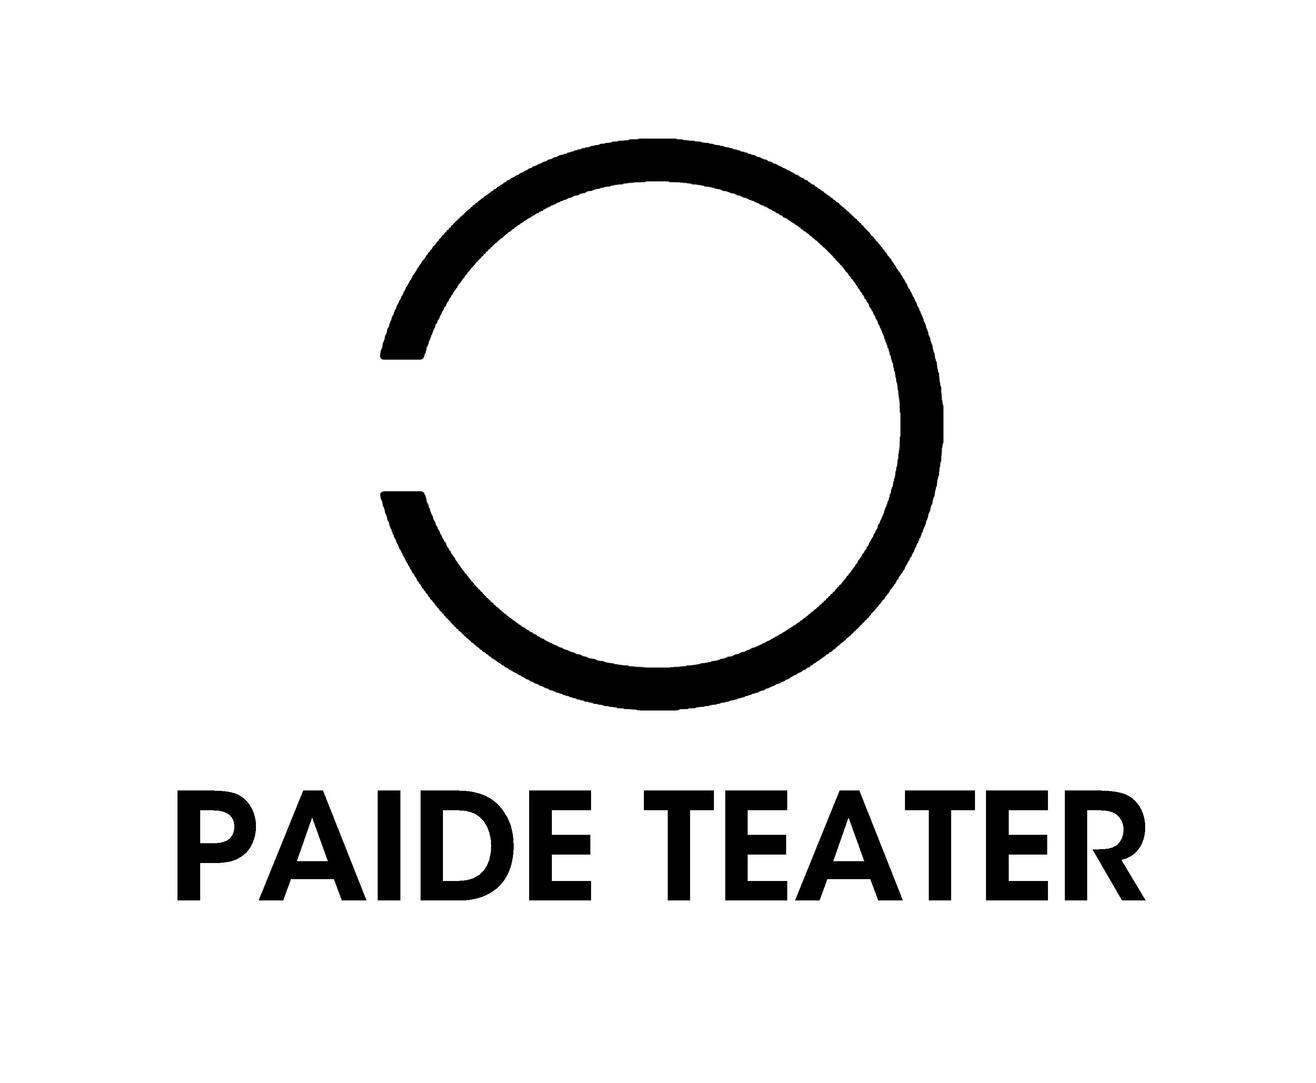 logo ja tekst transparent.png